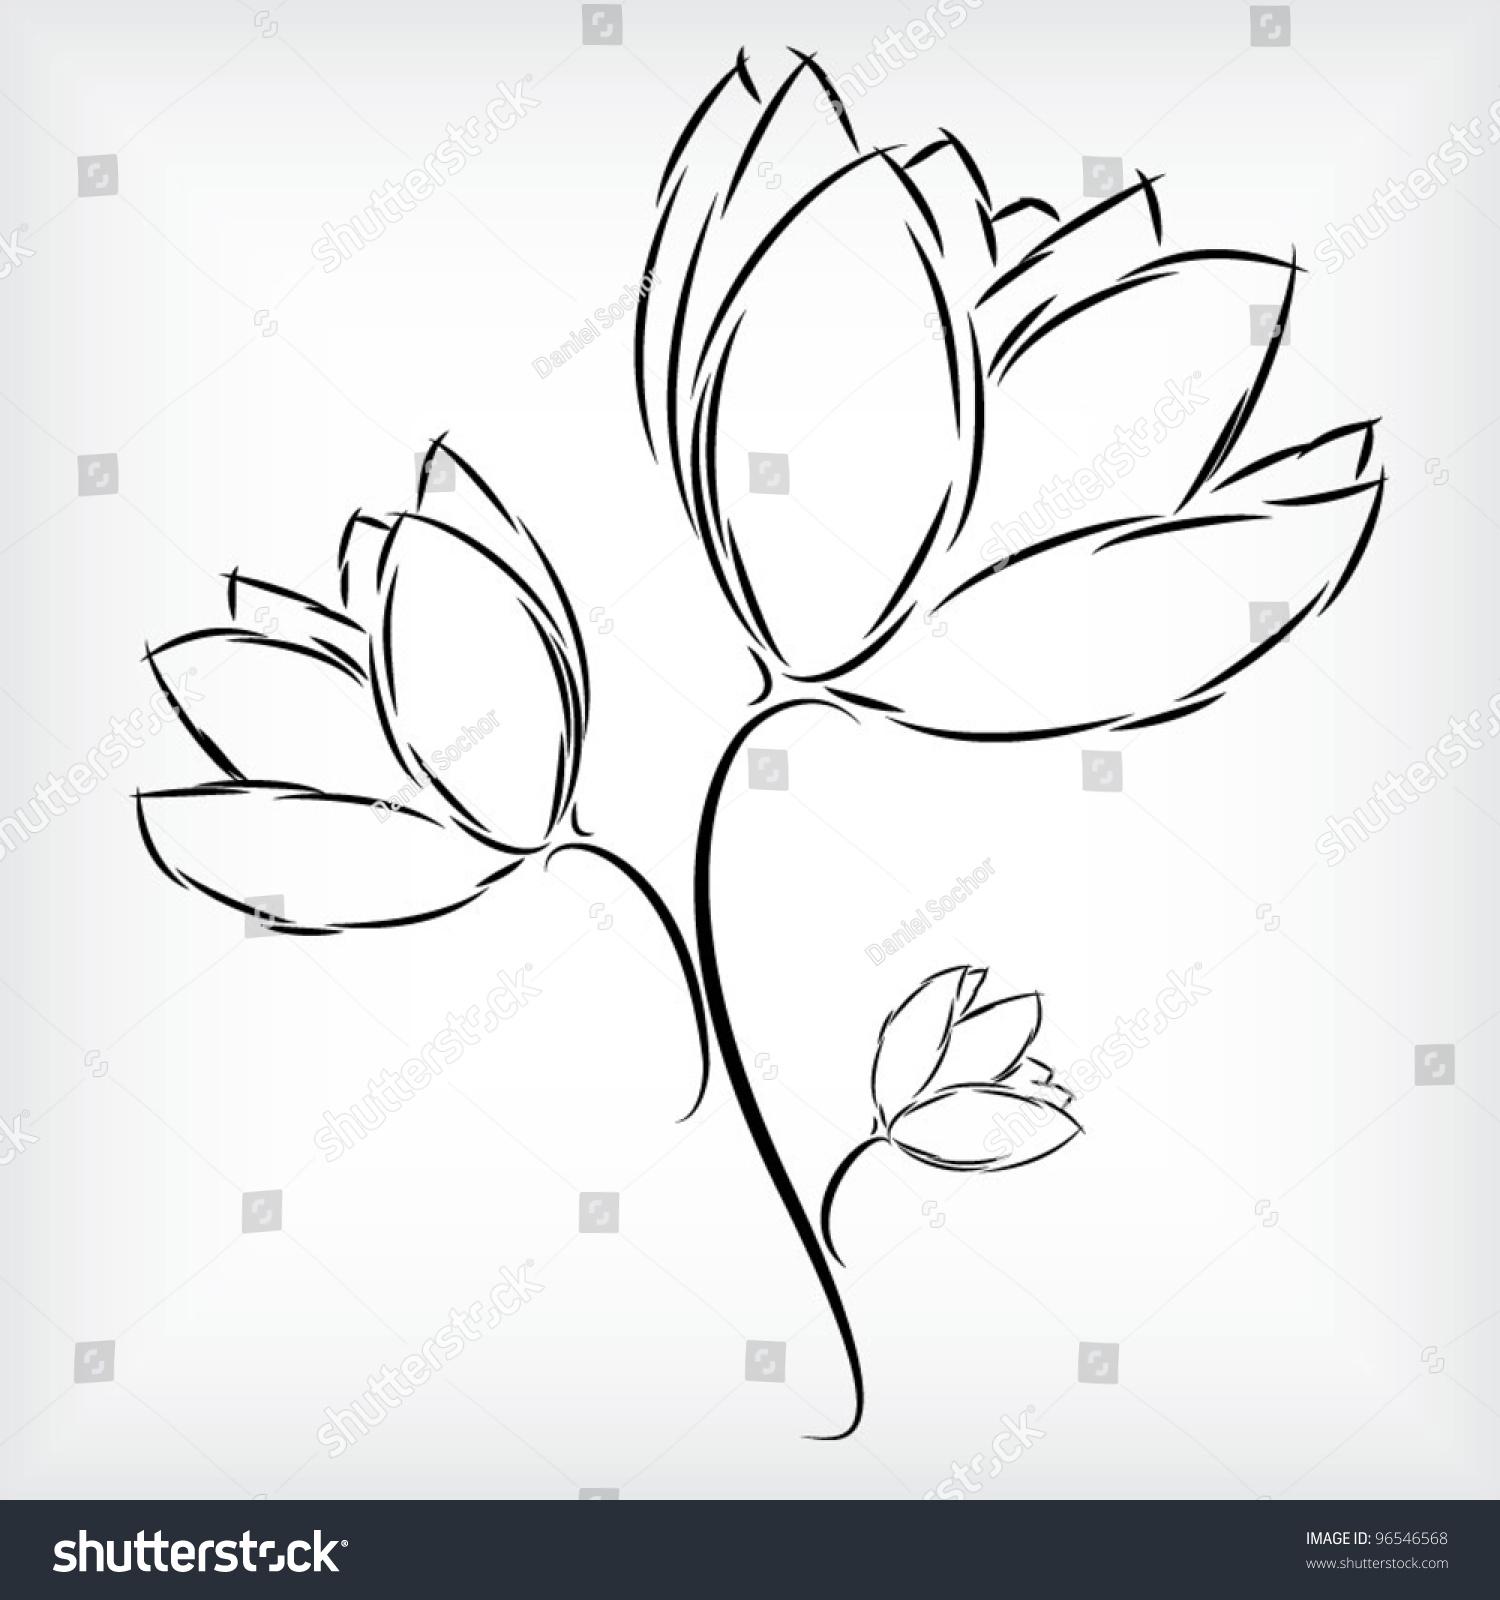 Vetor Stock De Simple Hand Drawing Beautiful Three Tulip Livre De Direitos 96546568